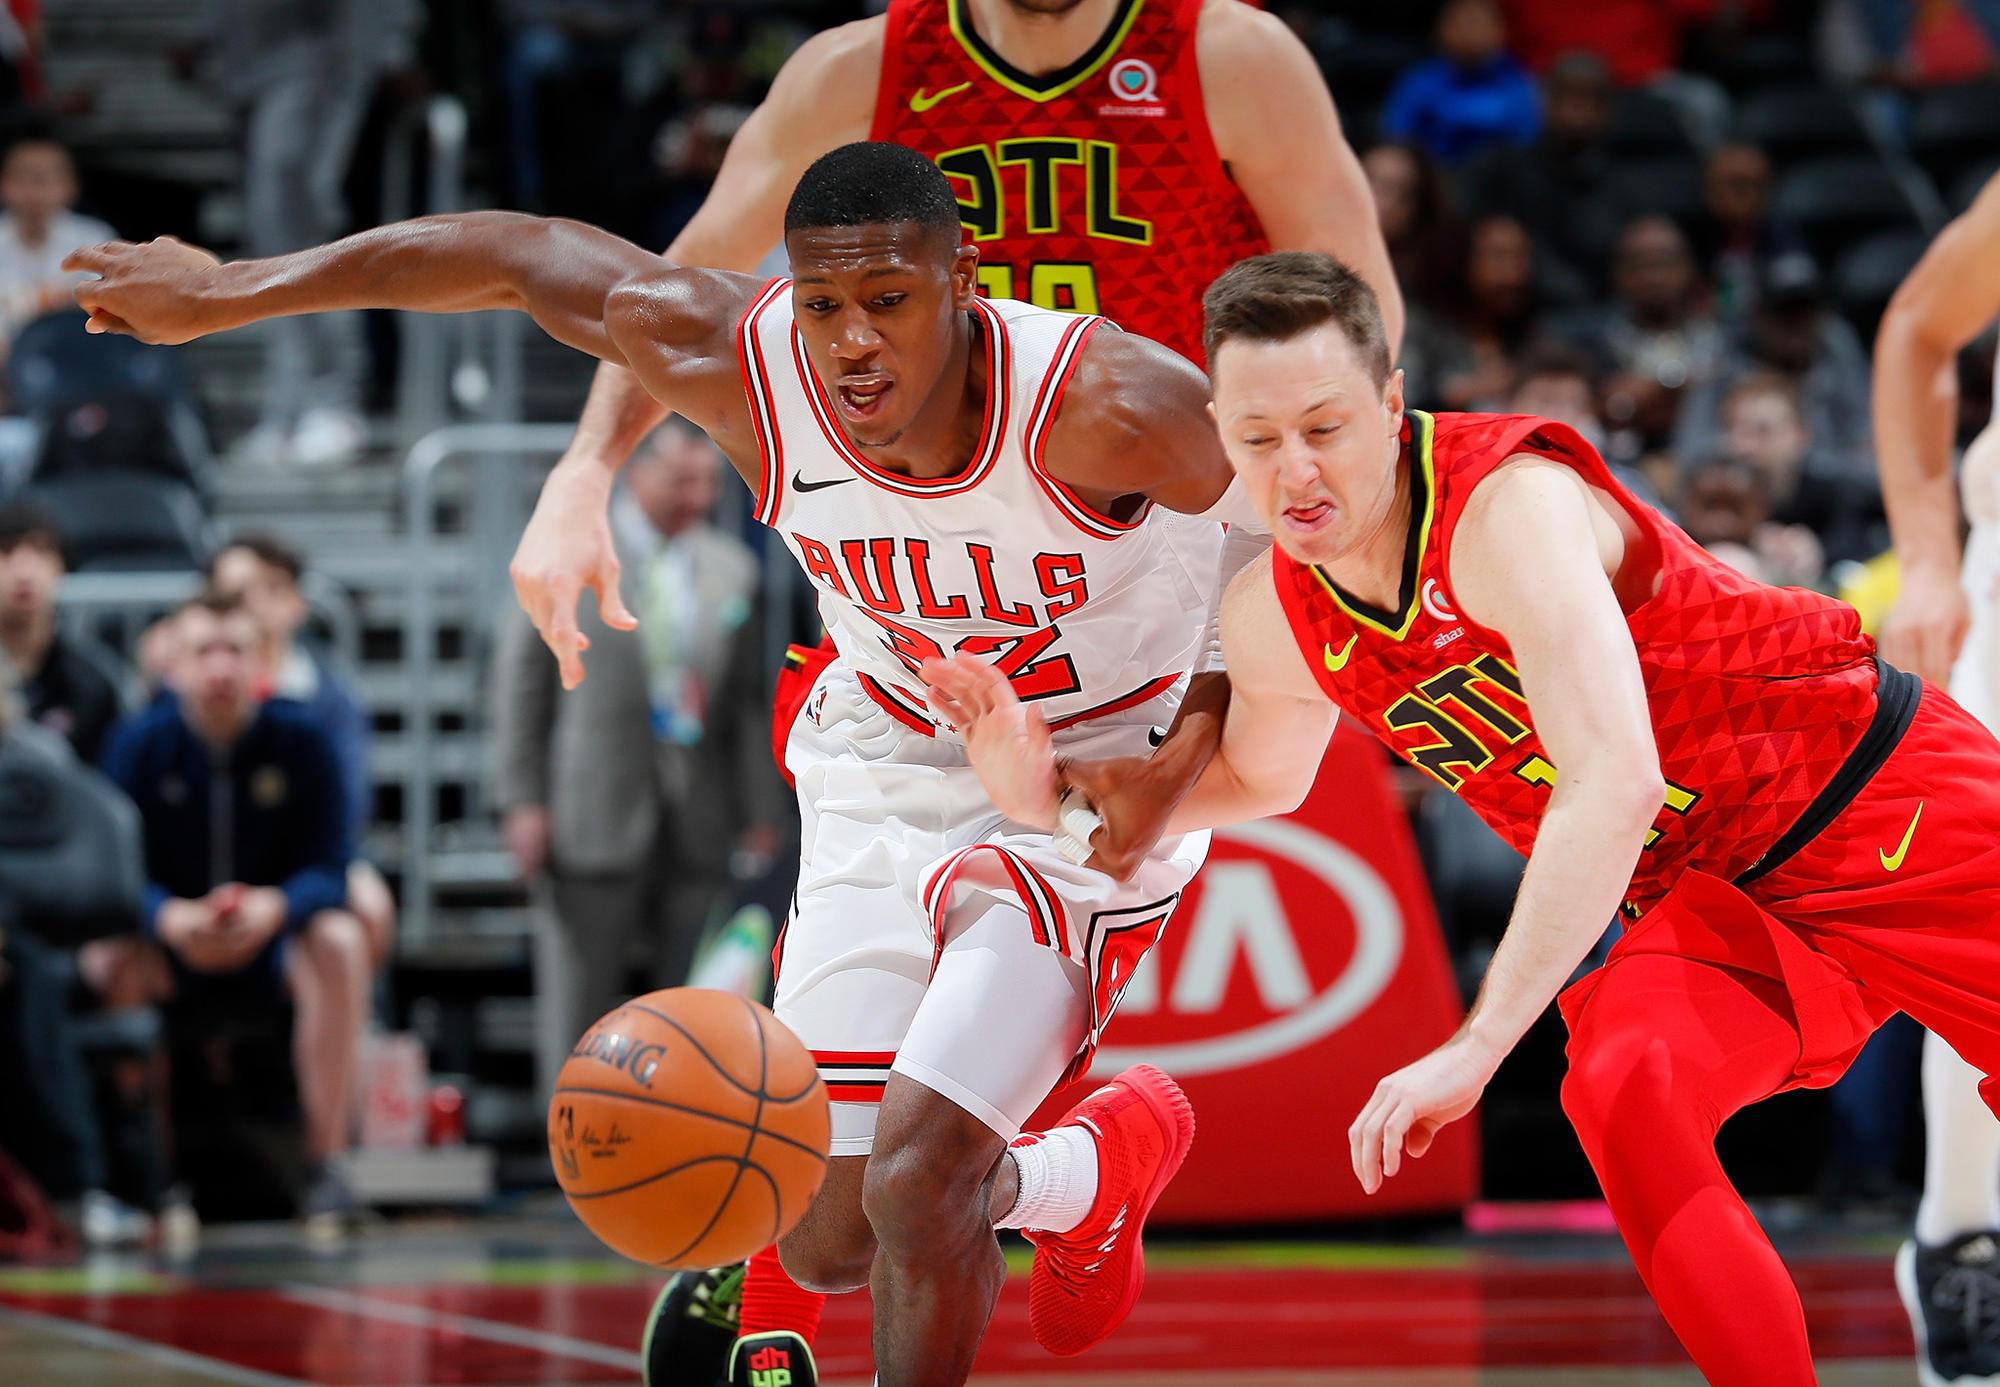 Bulls Players Mesmerized By The Hot Sauce Vs  Darren Rovell Mismatch